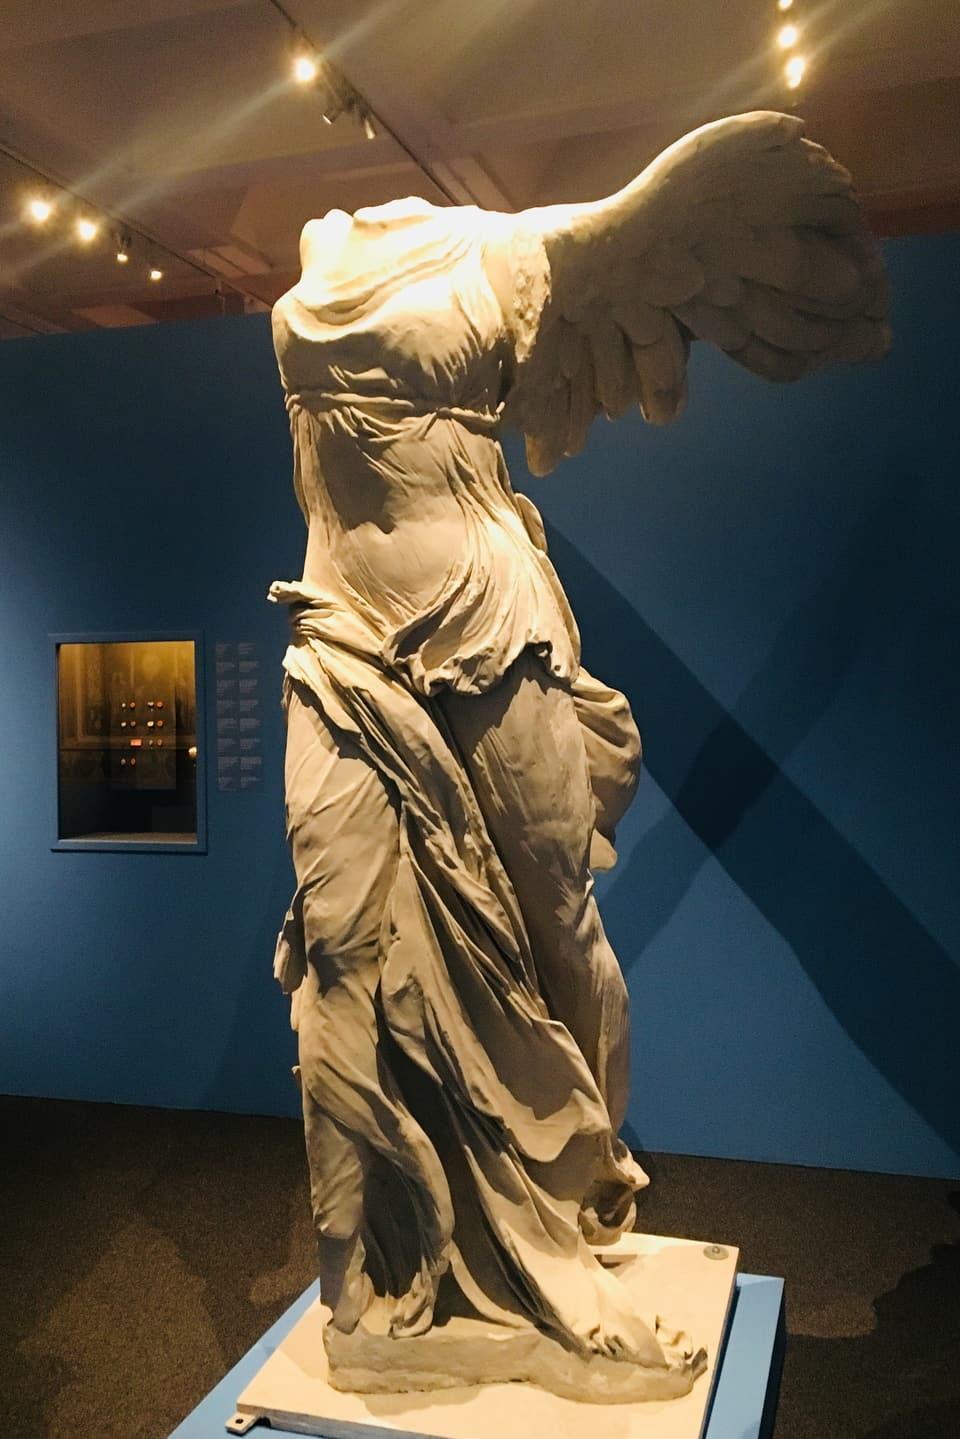 statua feminina cun alas, dentant senza chau.